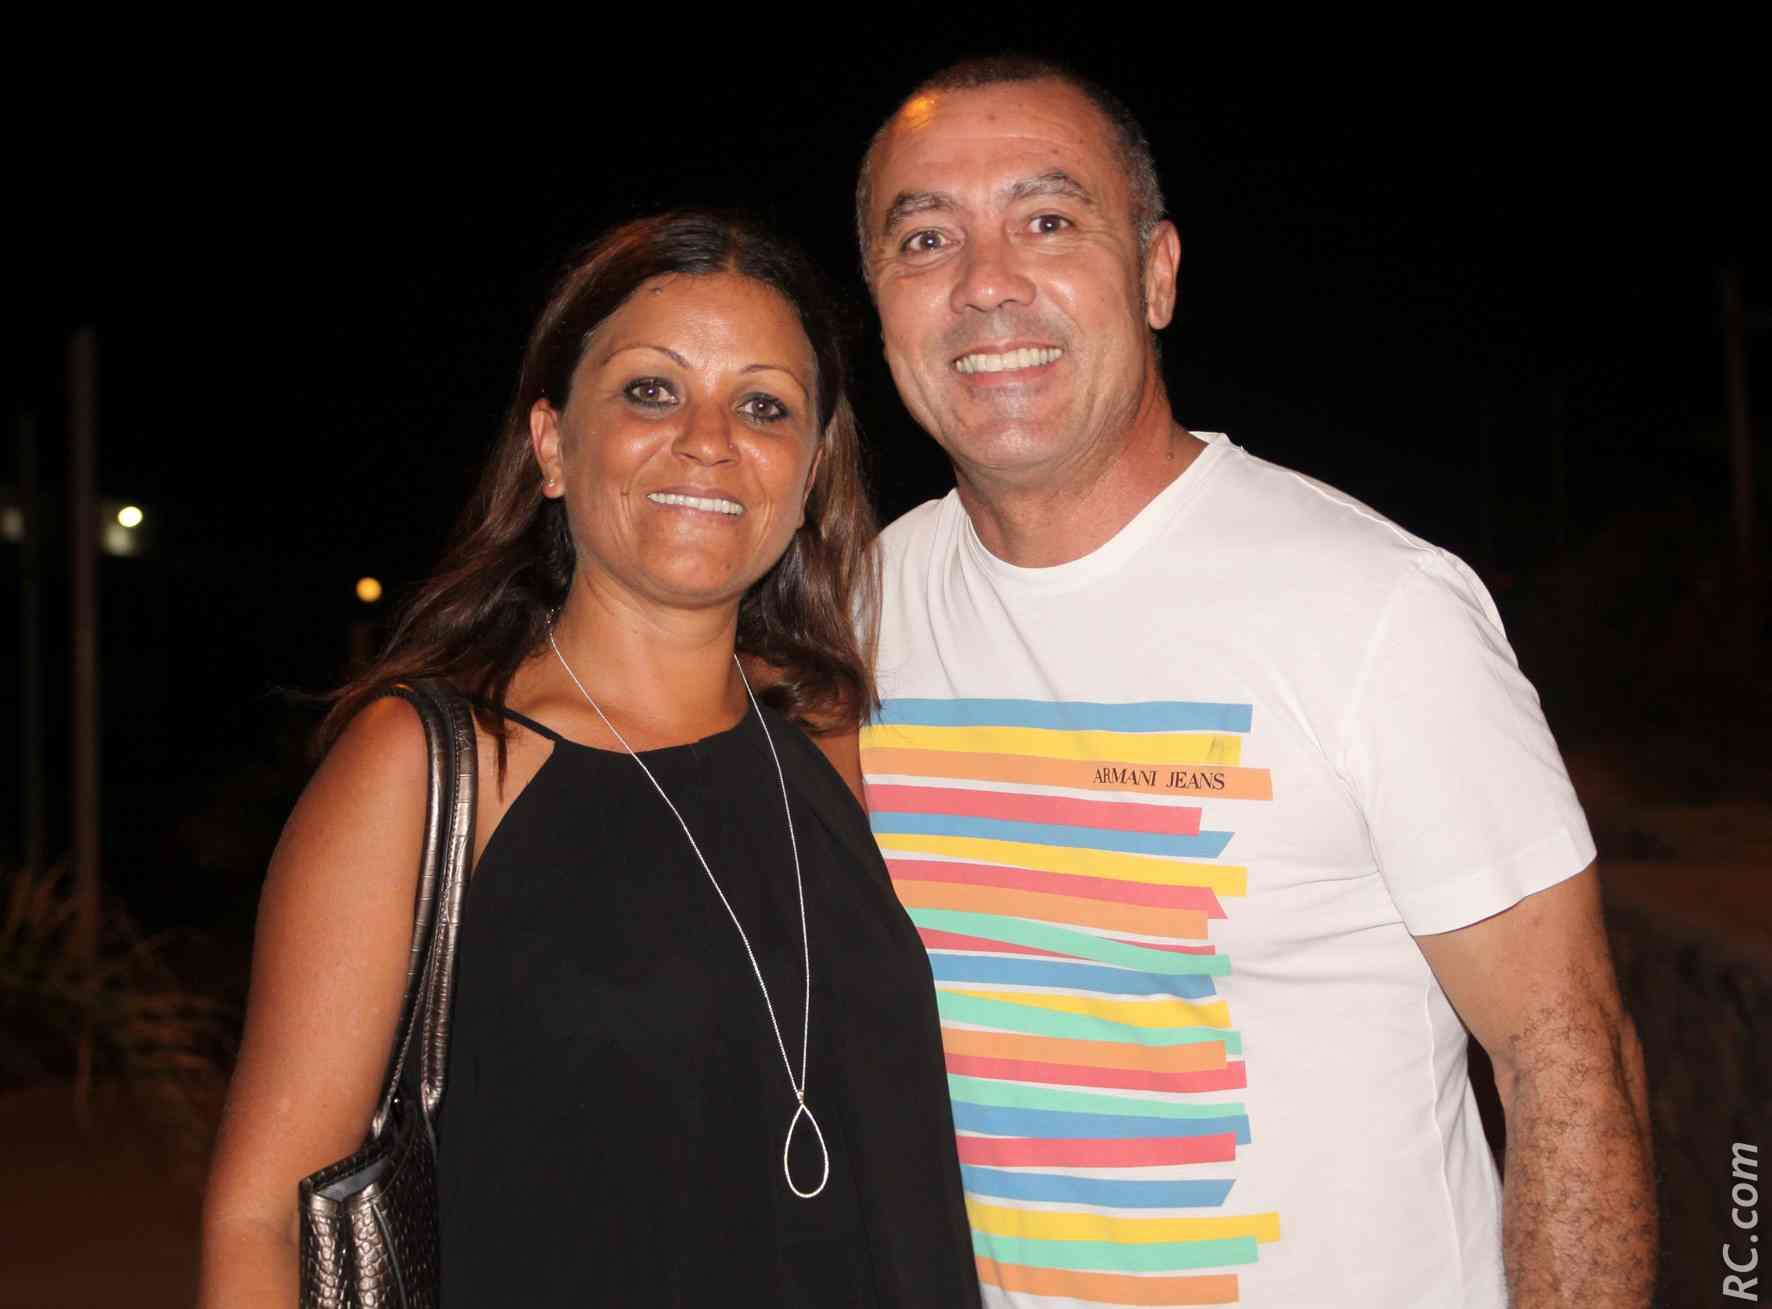 Patricia Morin de Comptoir Corail et Dominique Barret